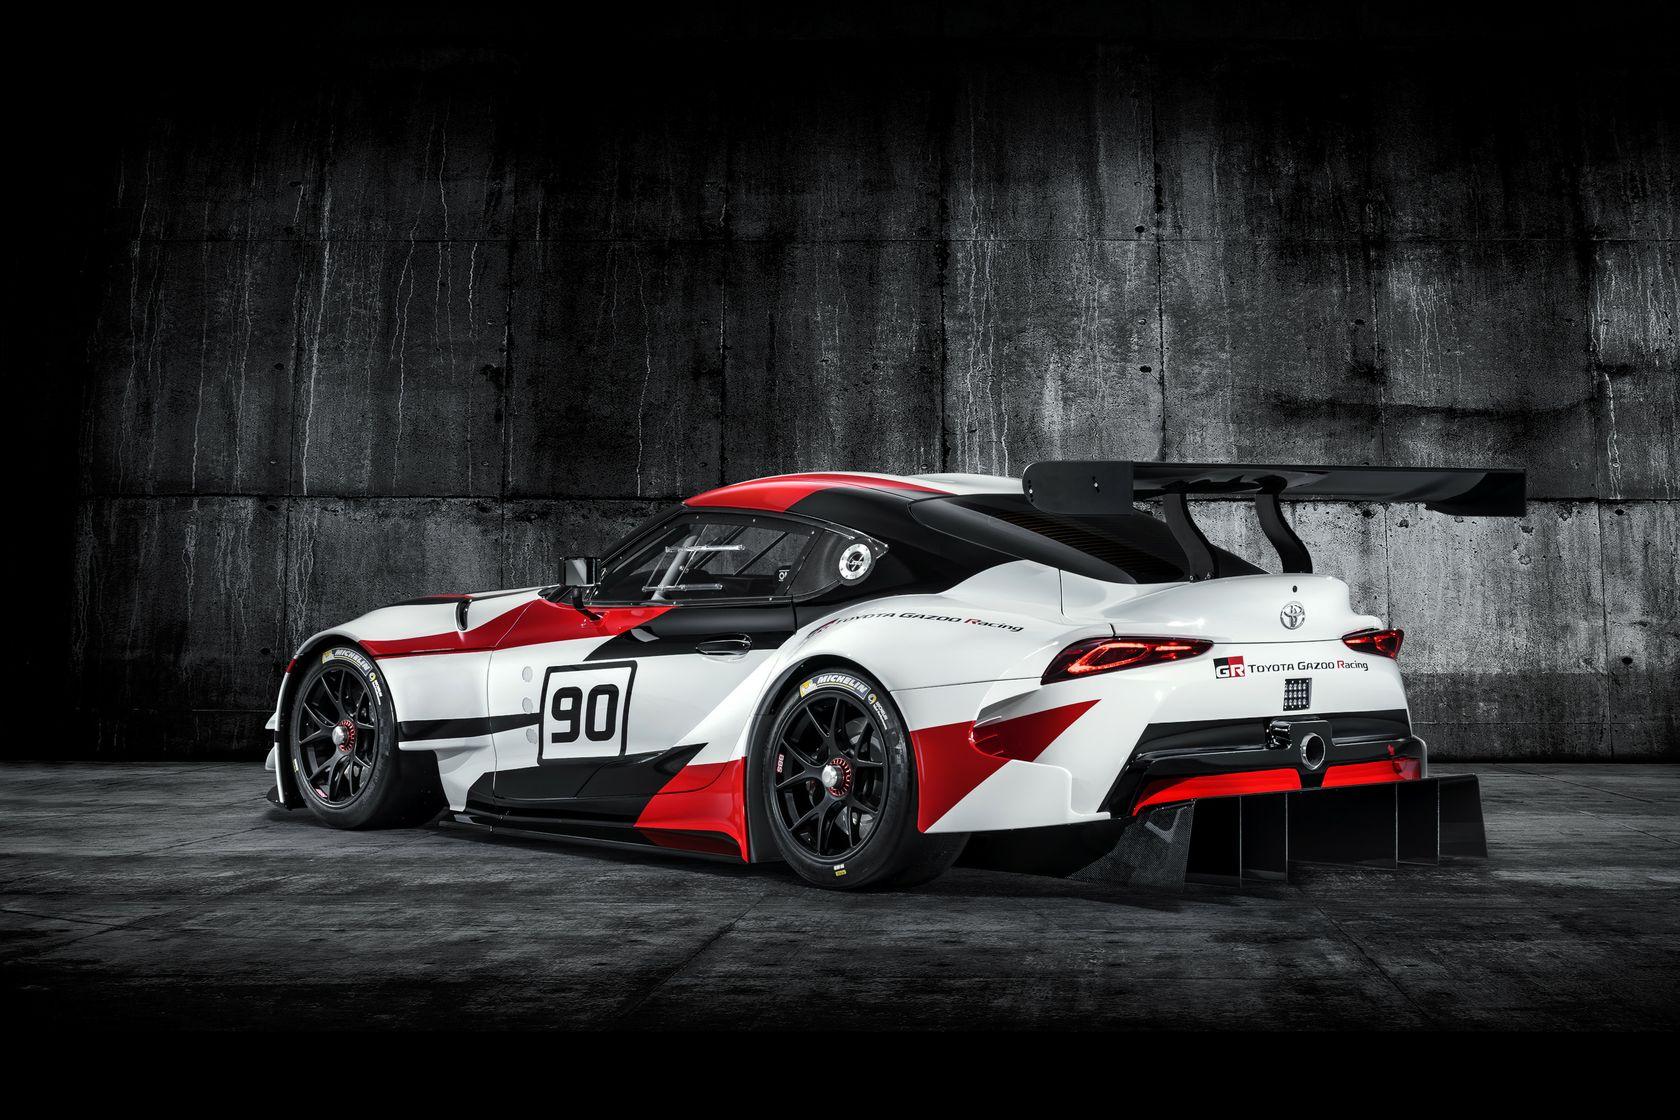 GR Supra Racing Concept - Studio - 08